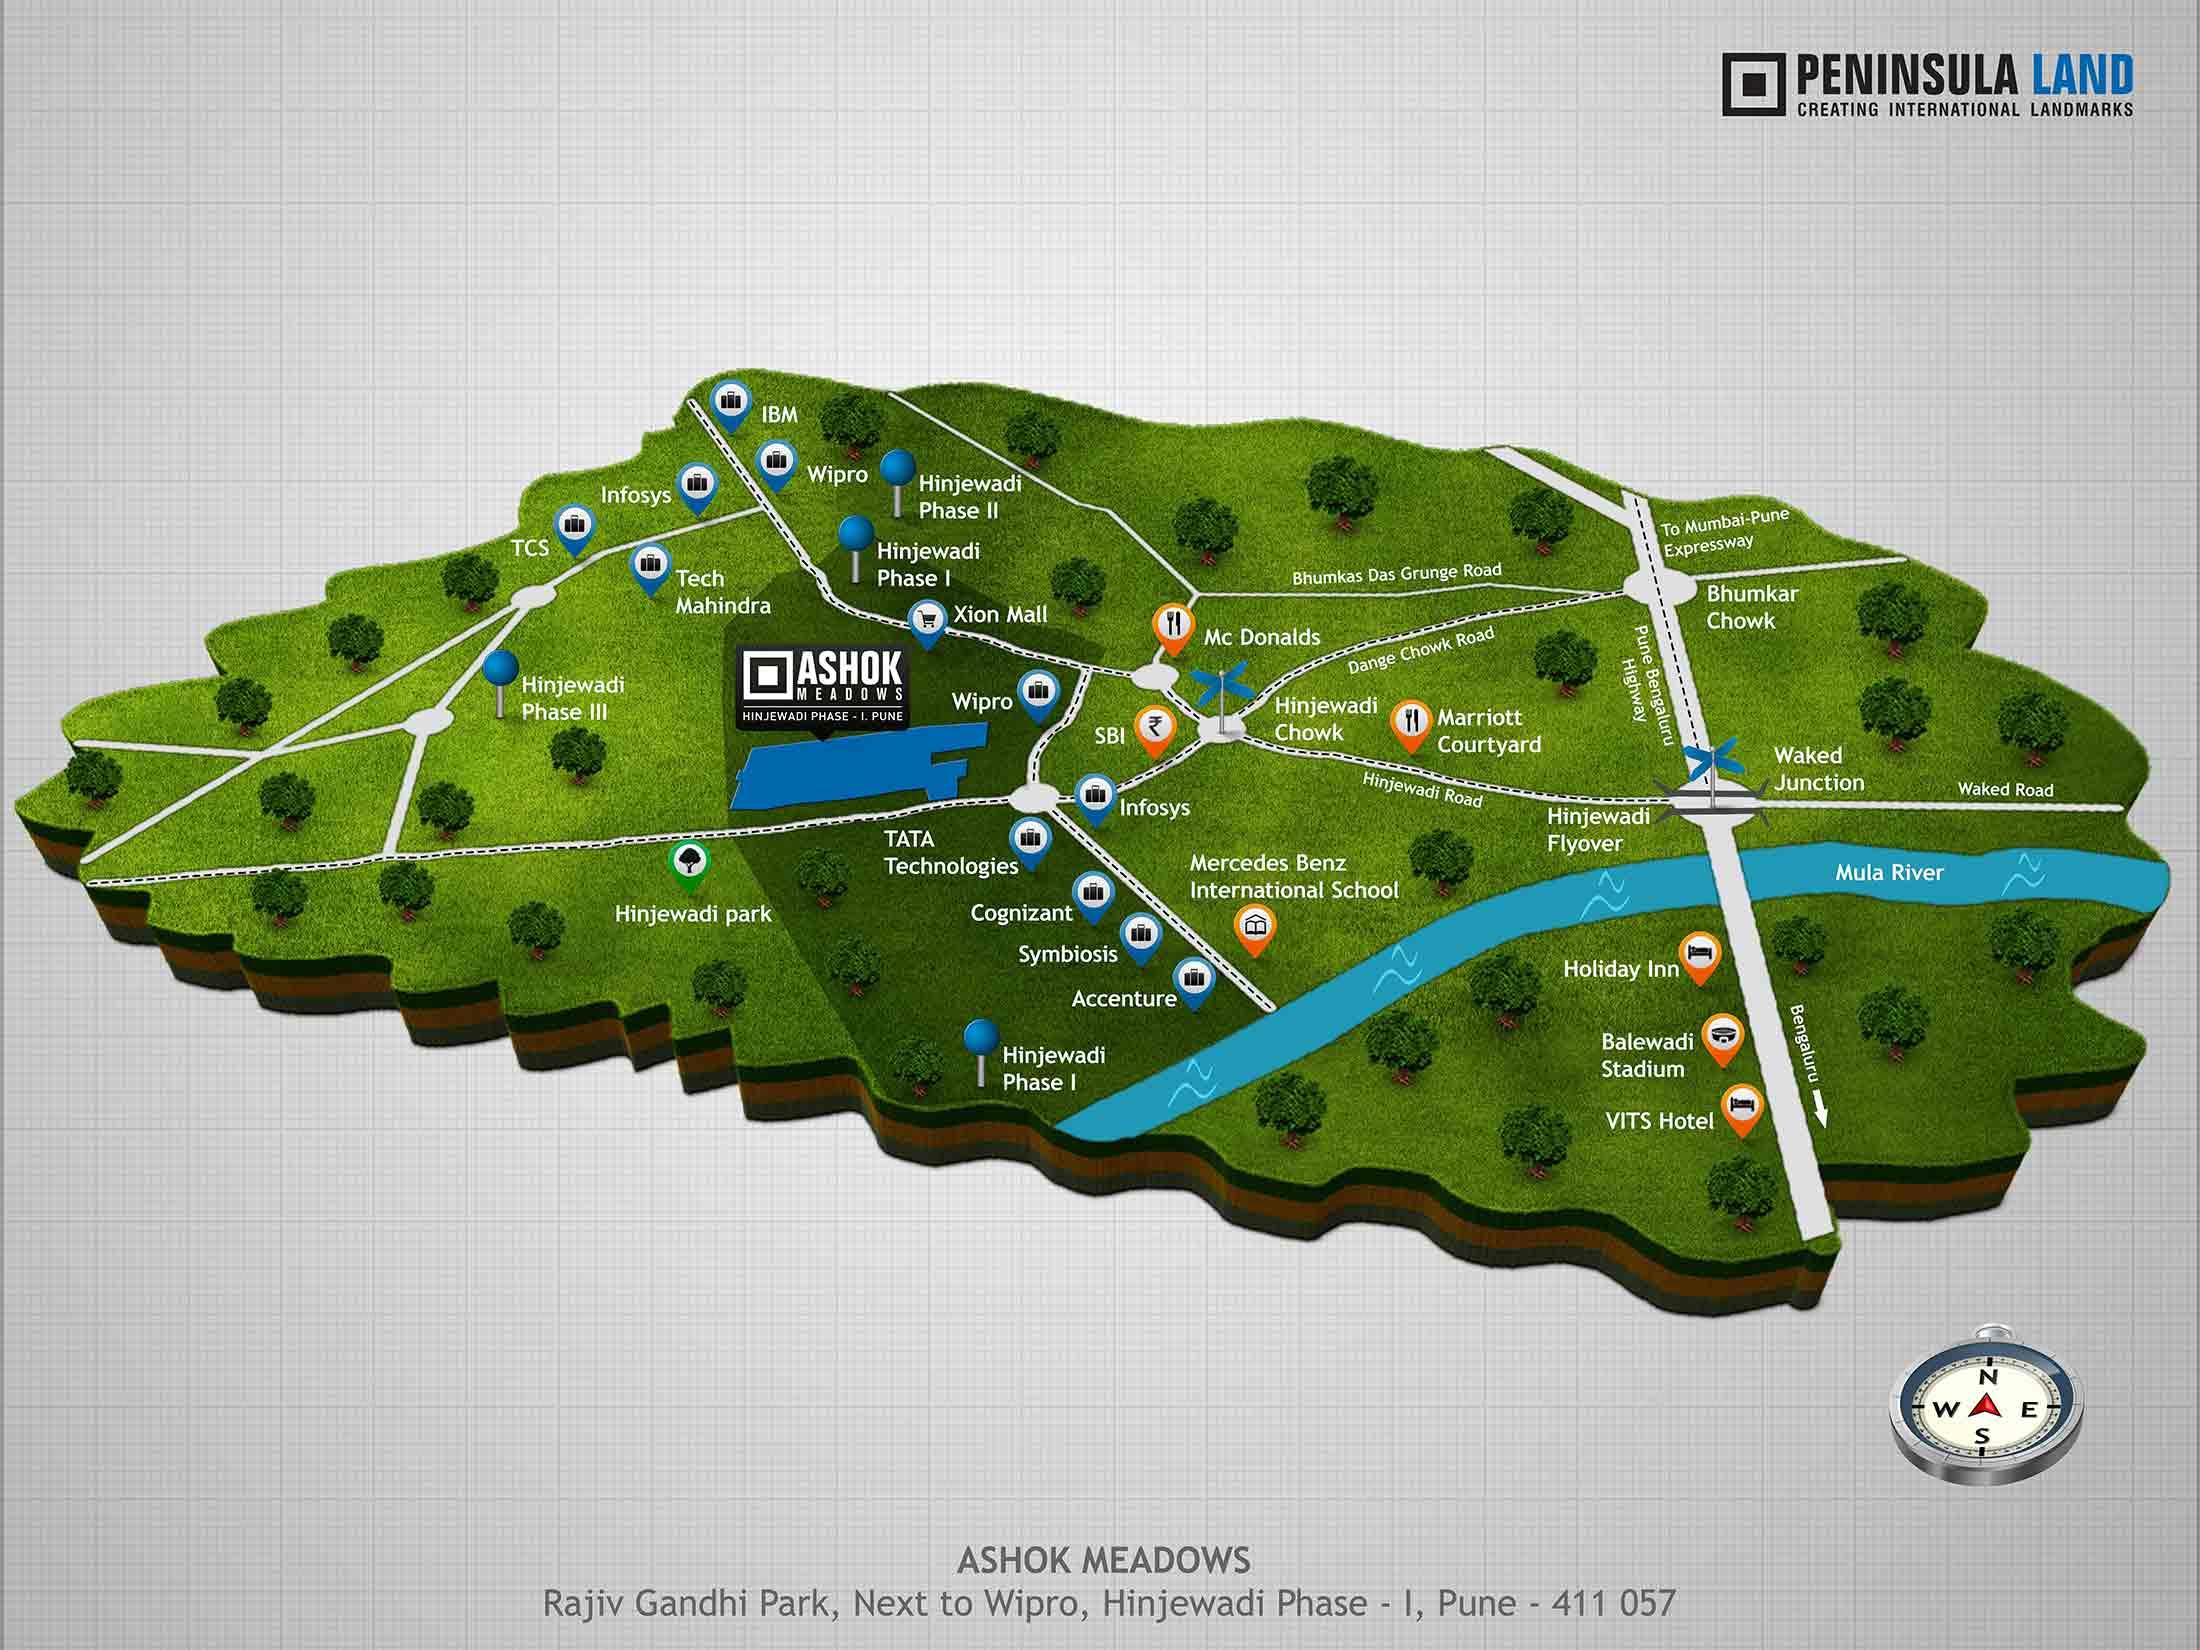 peninsula ashok meadows location image1